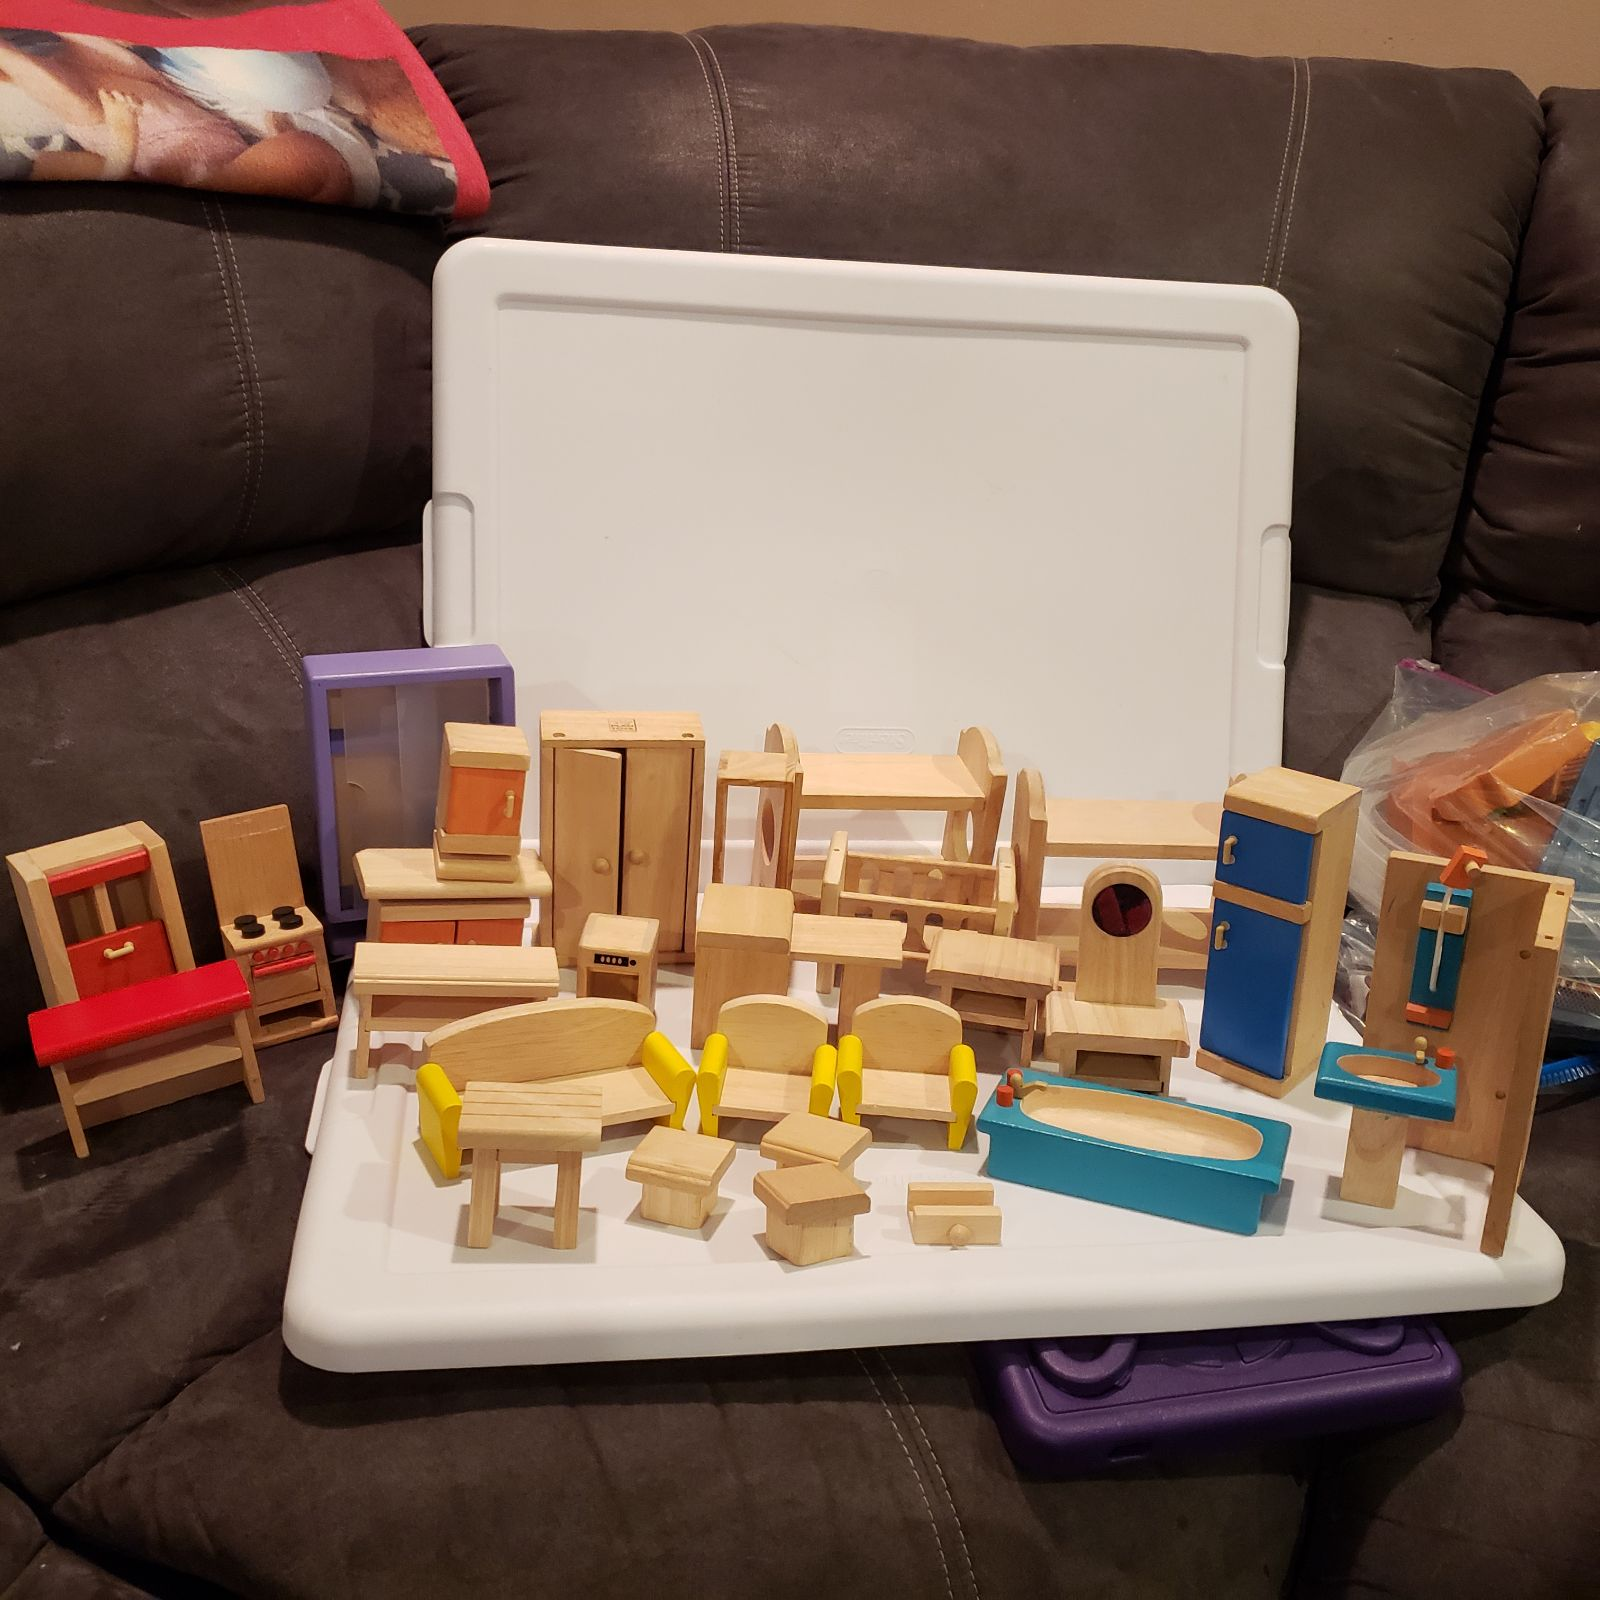 PlanToys Wooden Dollhouse Furniture